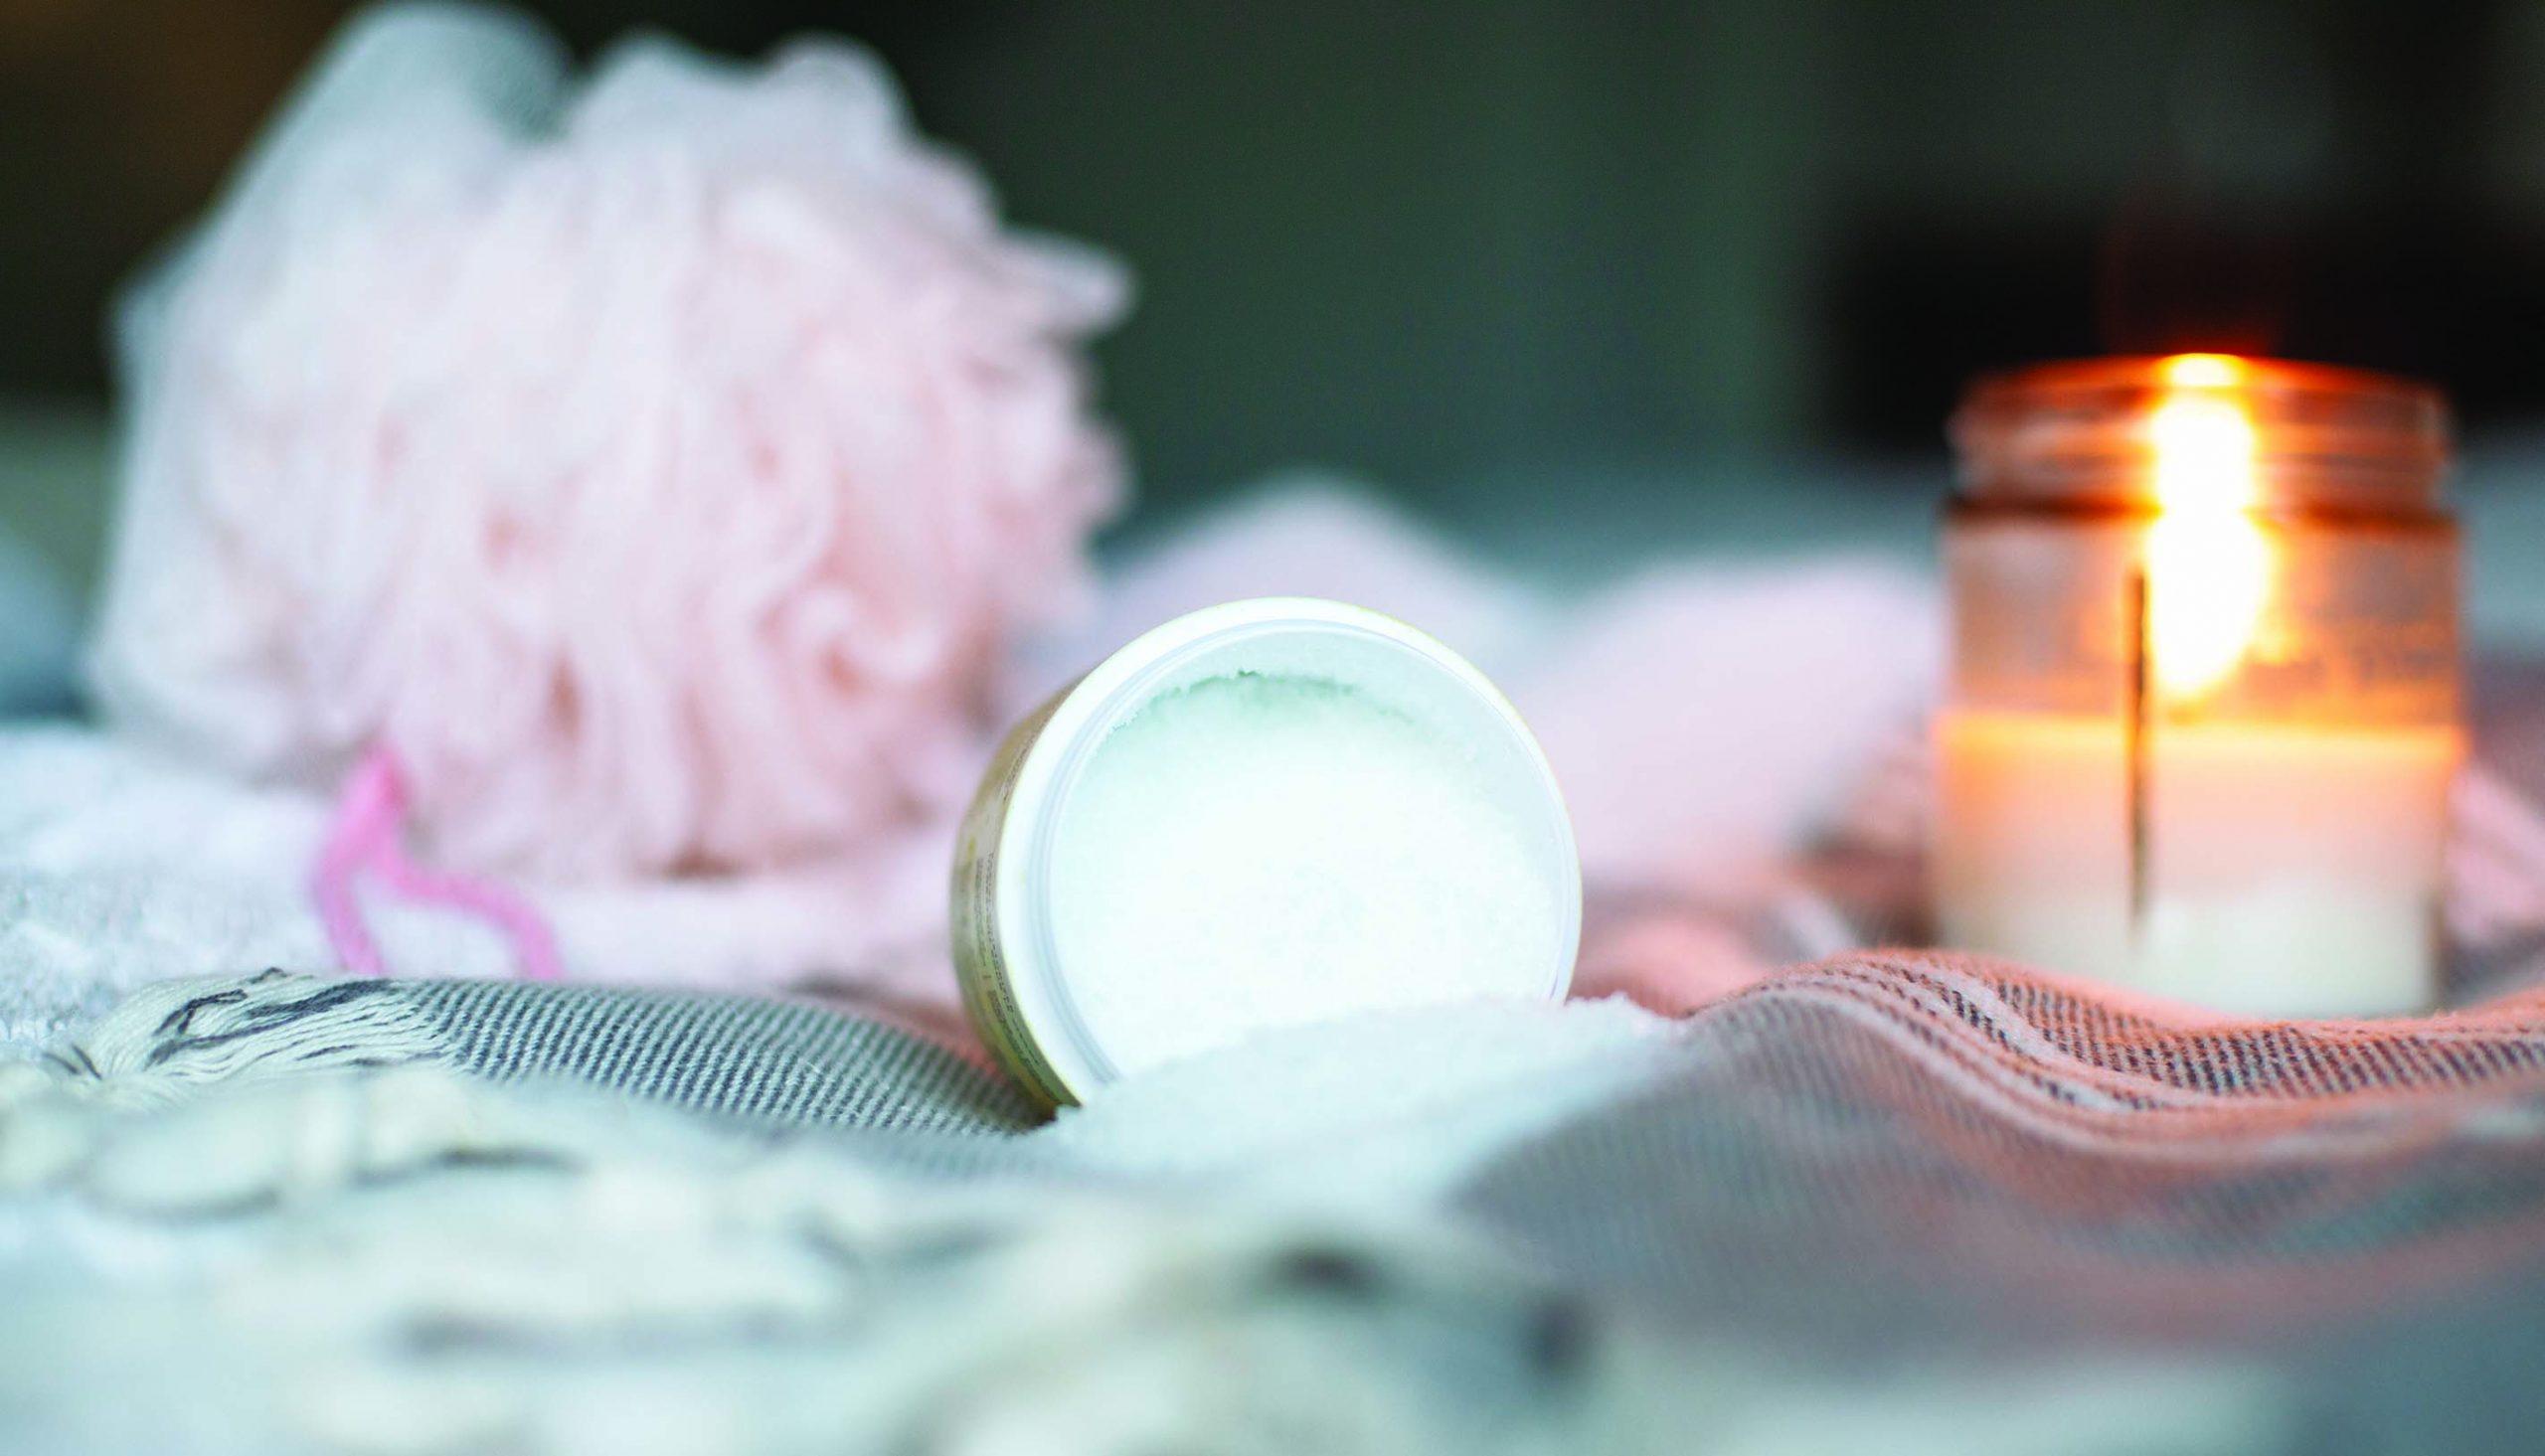 lit candle and loufa